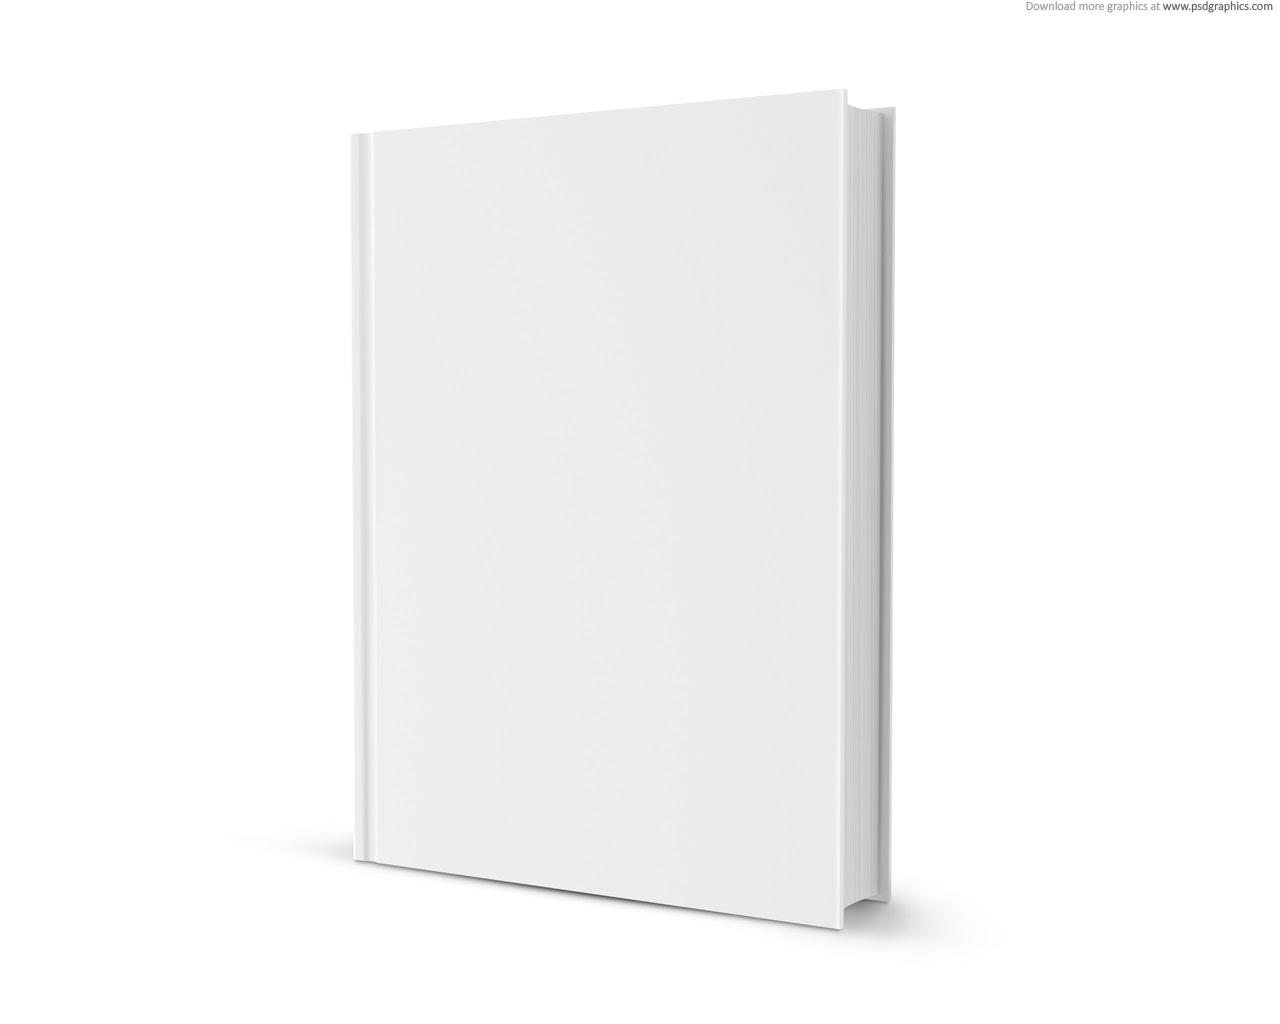 Blank white book   PSDGraphics